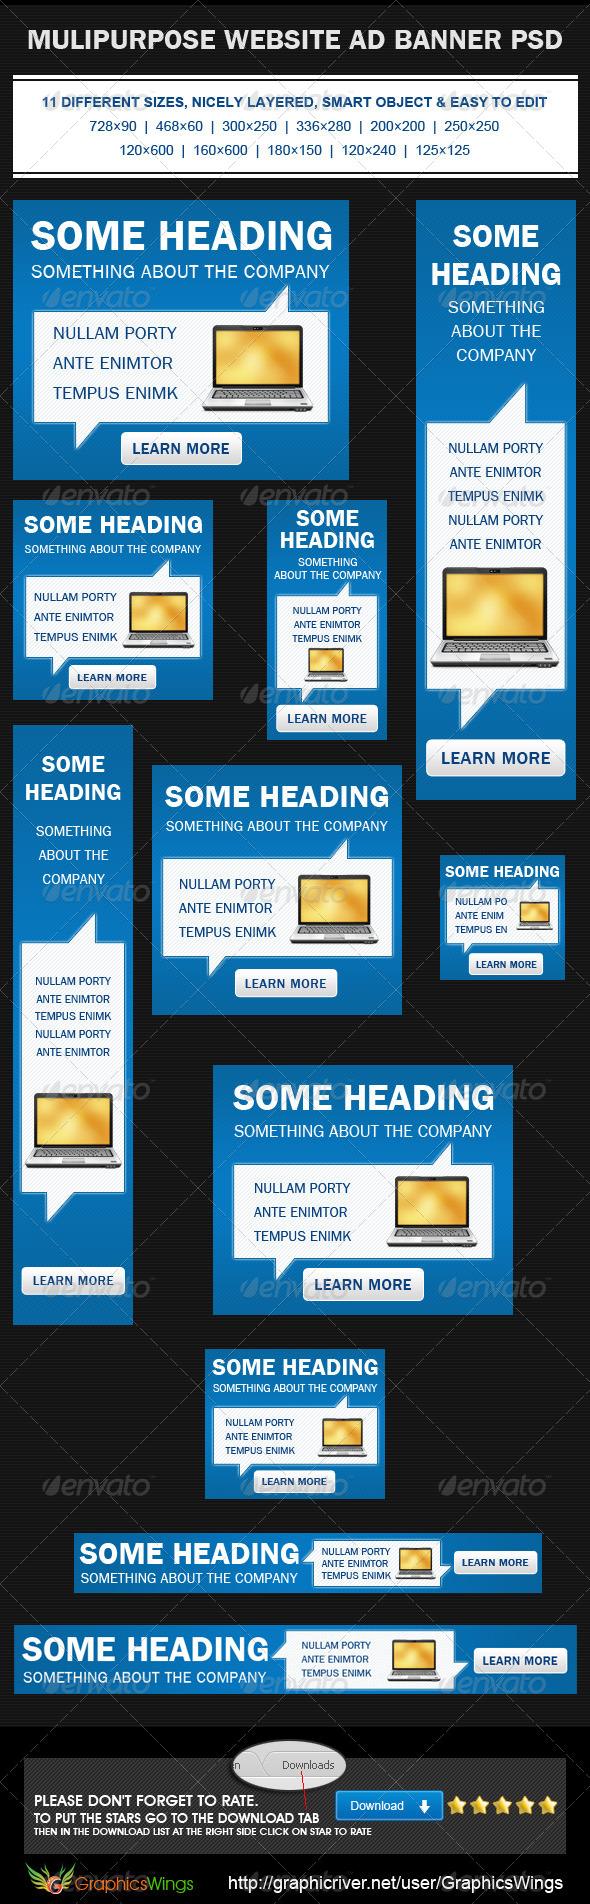 GraphicRiver Multipurpose Web Banner Ad PSD Template 4485936